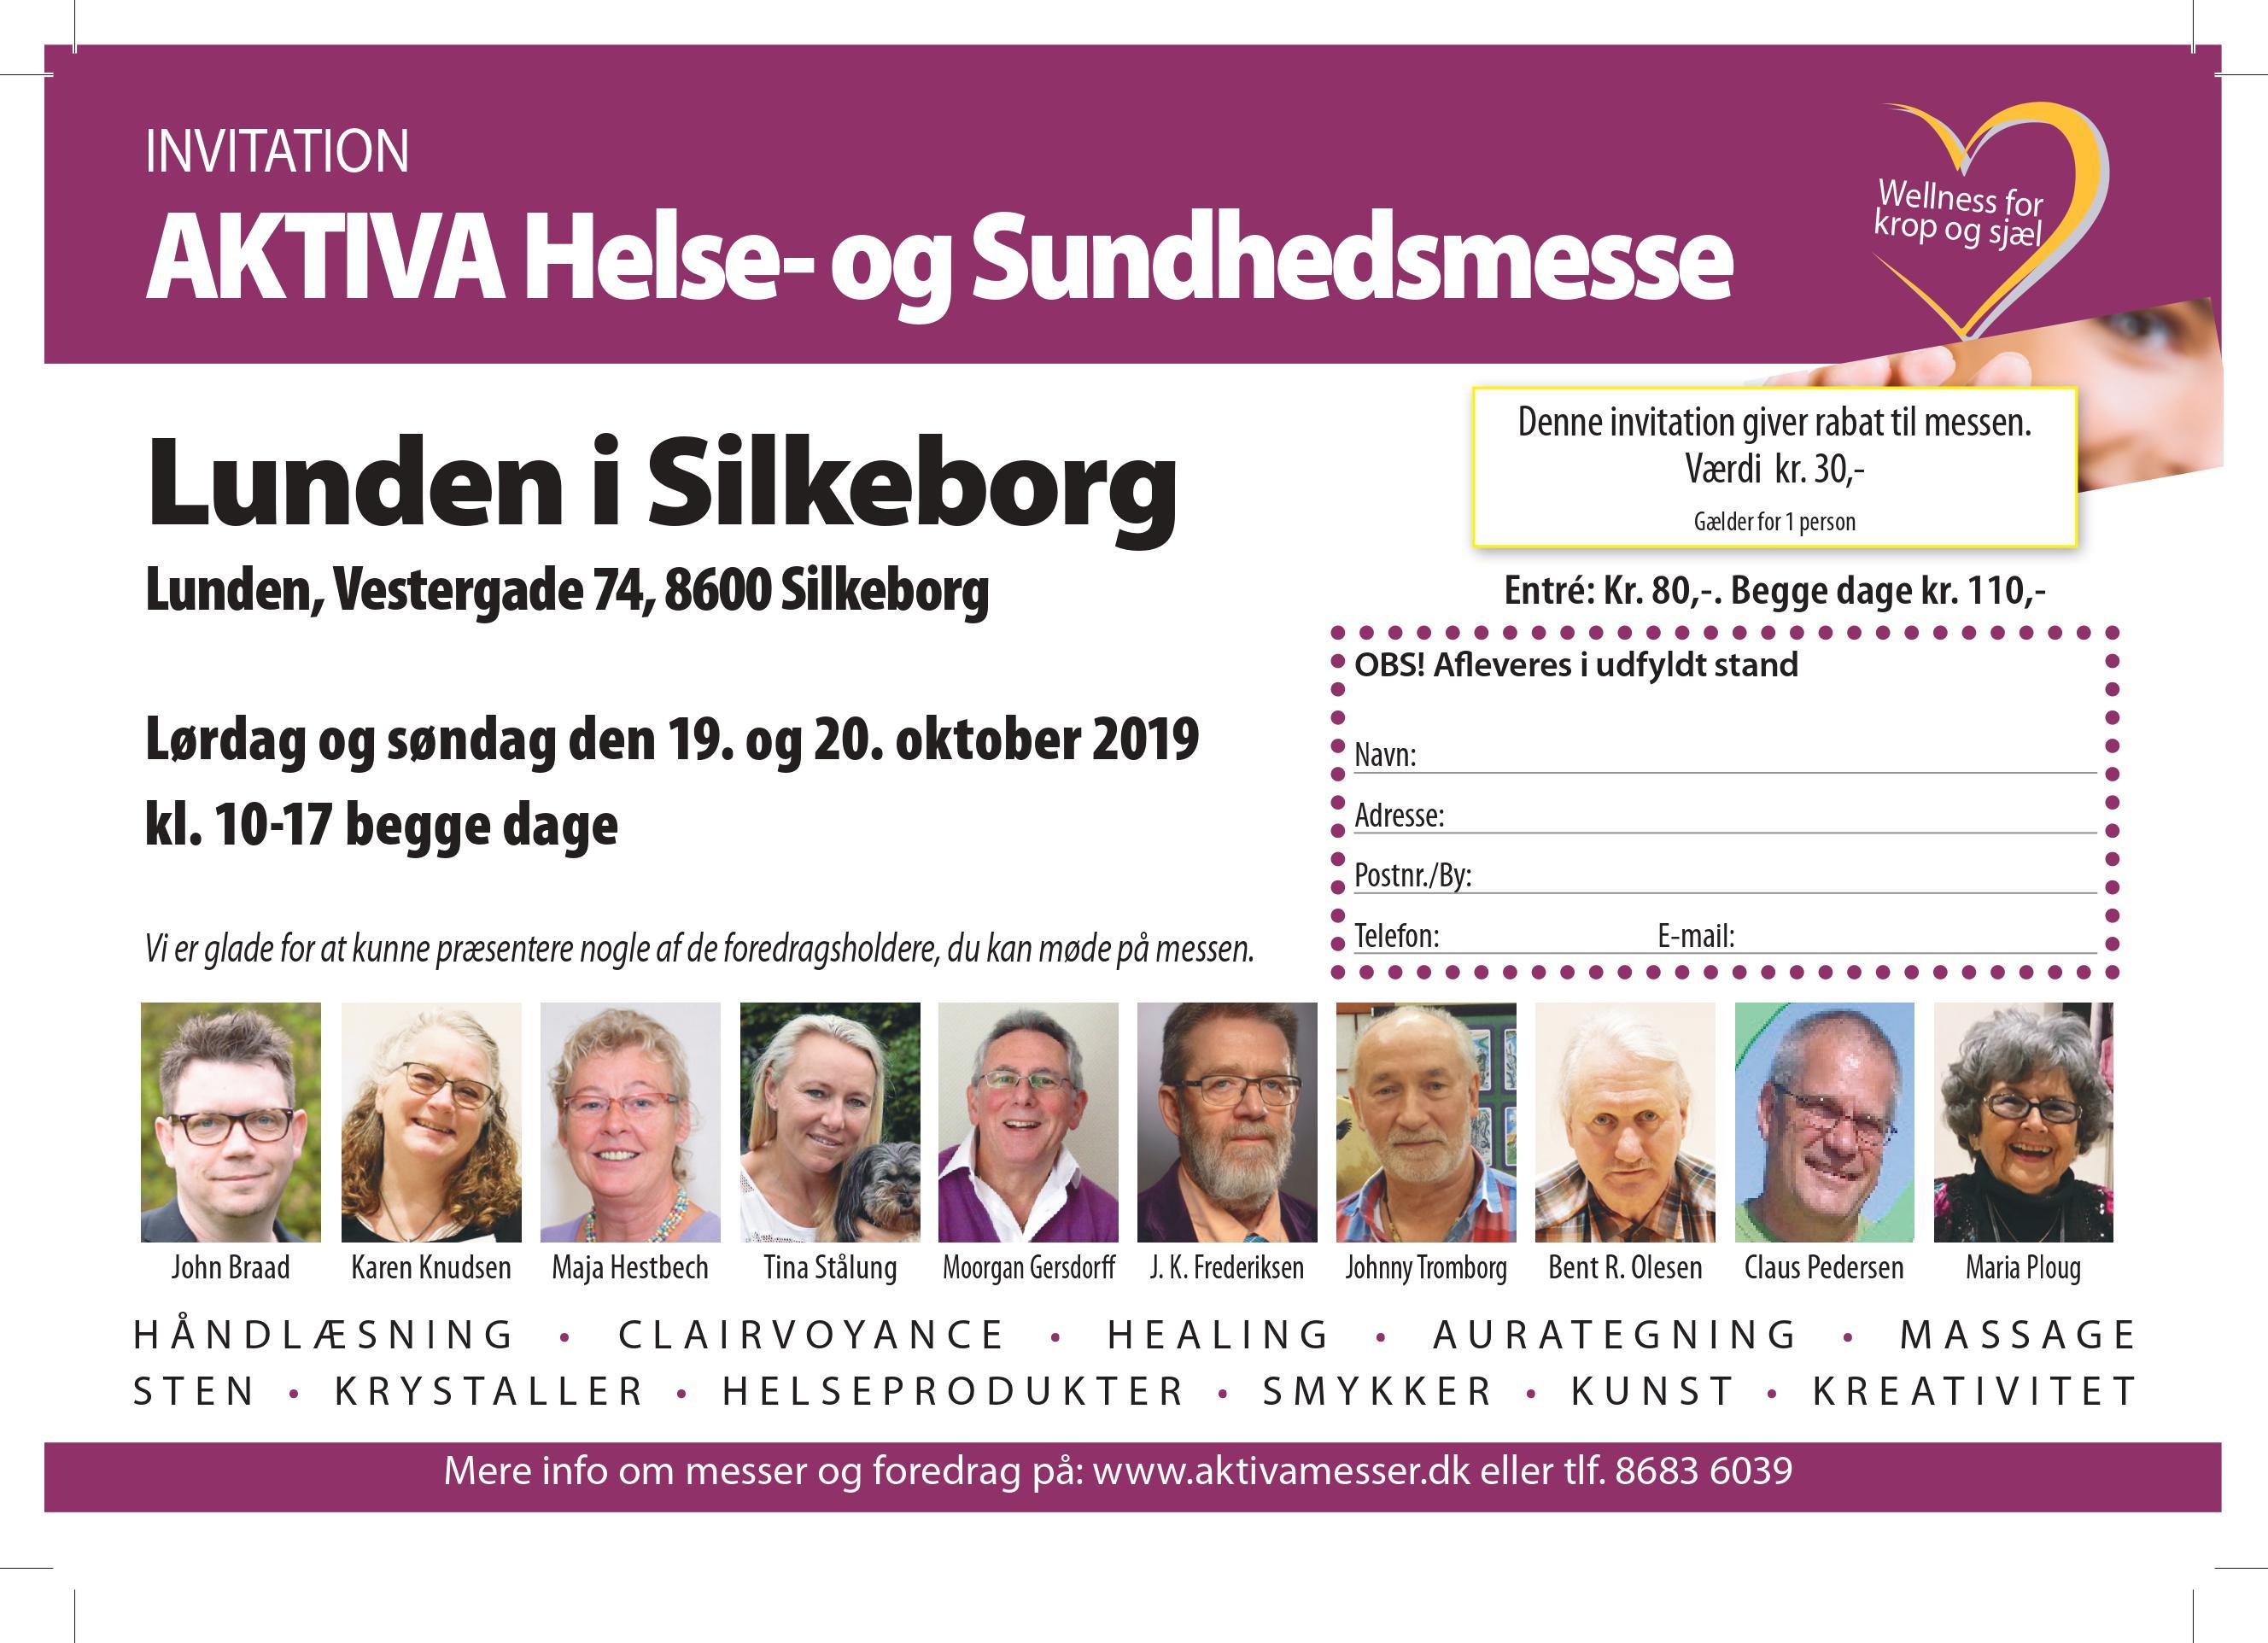 AKTIVA helsemesse i Silkeborg